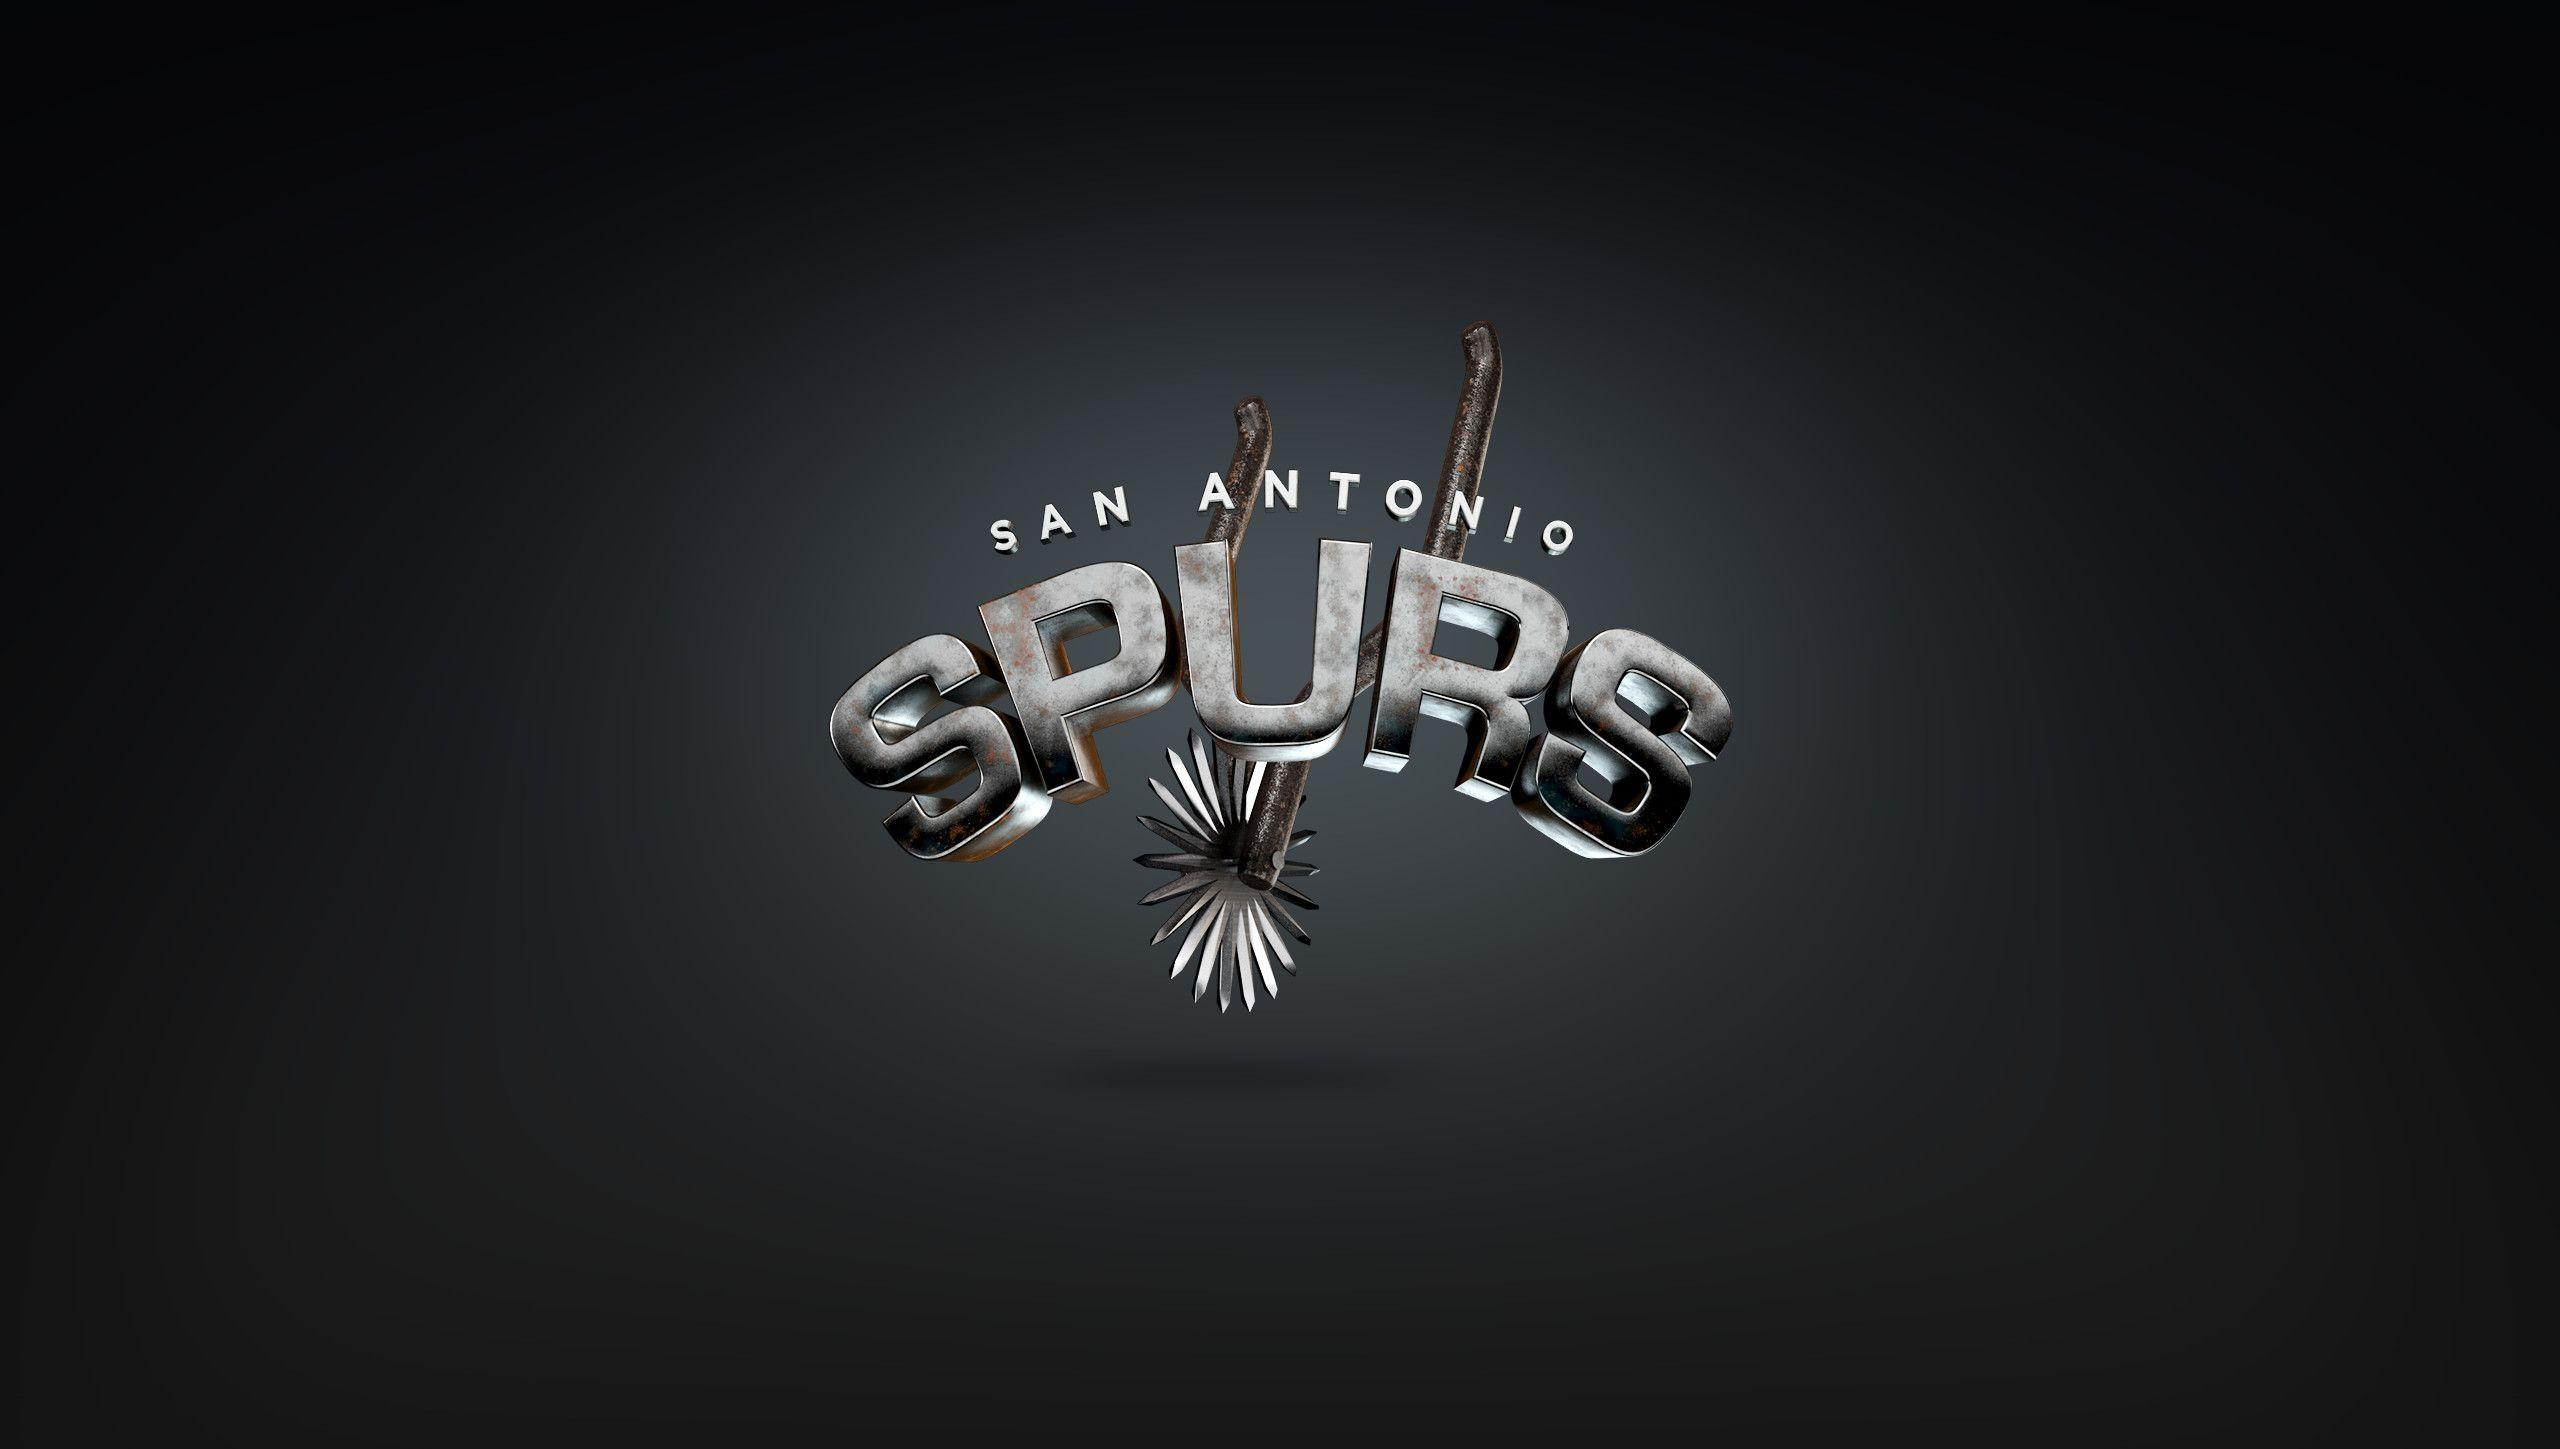 San Antonio Spurs Wallpapers Wallpaper Cave